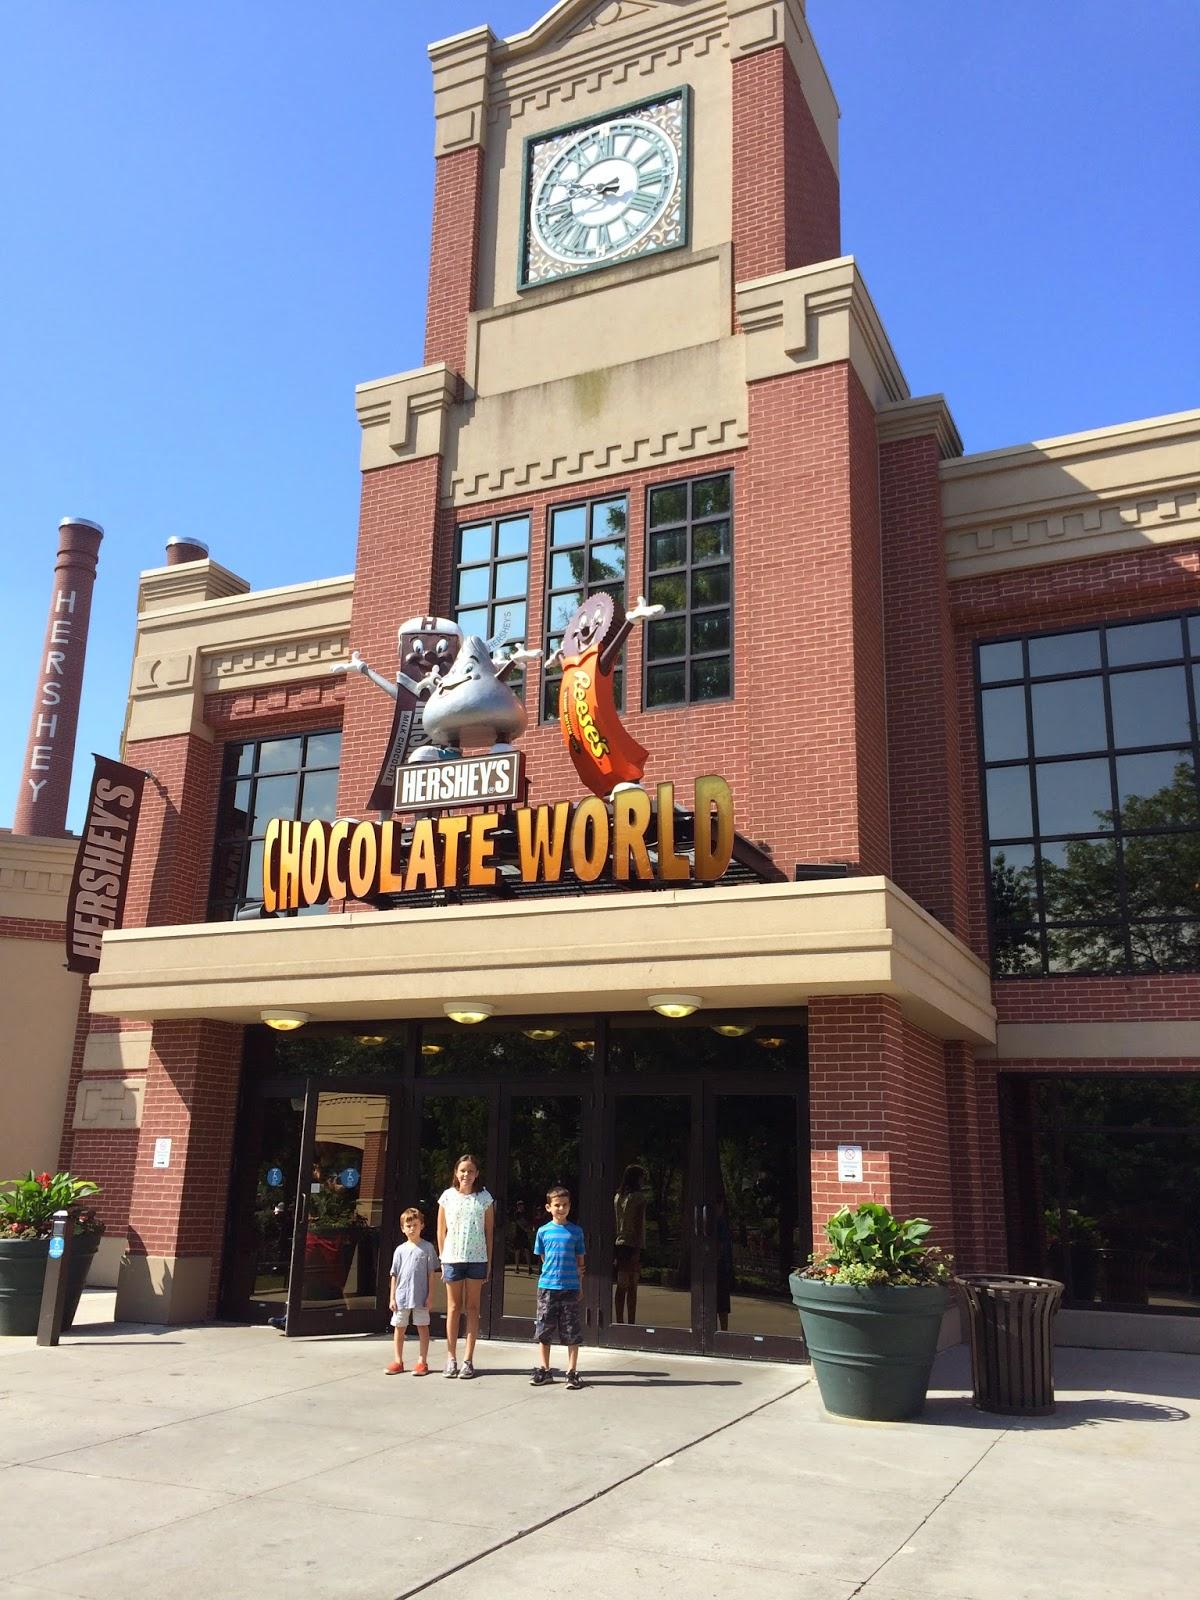 Carful of Kids: Hershey's Chocolate World and Niagara Falls at Night